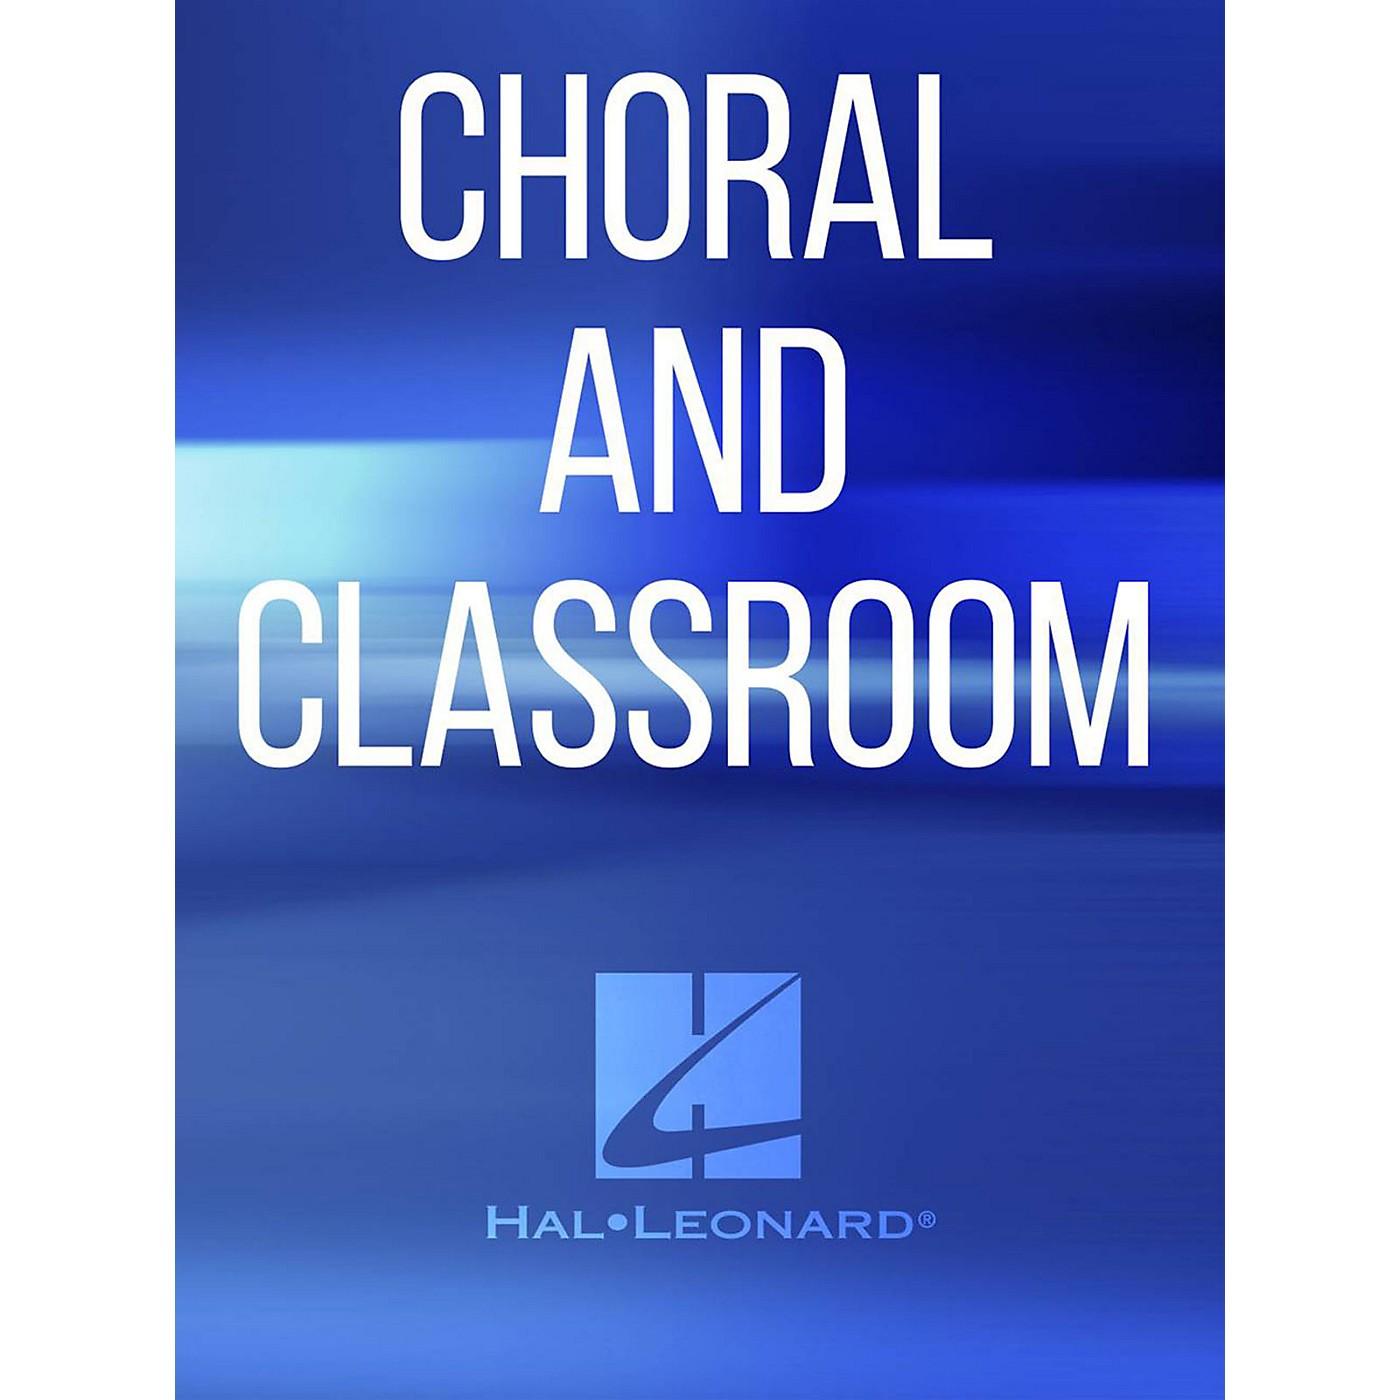 Hal Leonard Castle on a Cloud (from Les Misérables) SATB Arranged by Linda Spevacek thumbnail